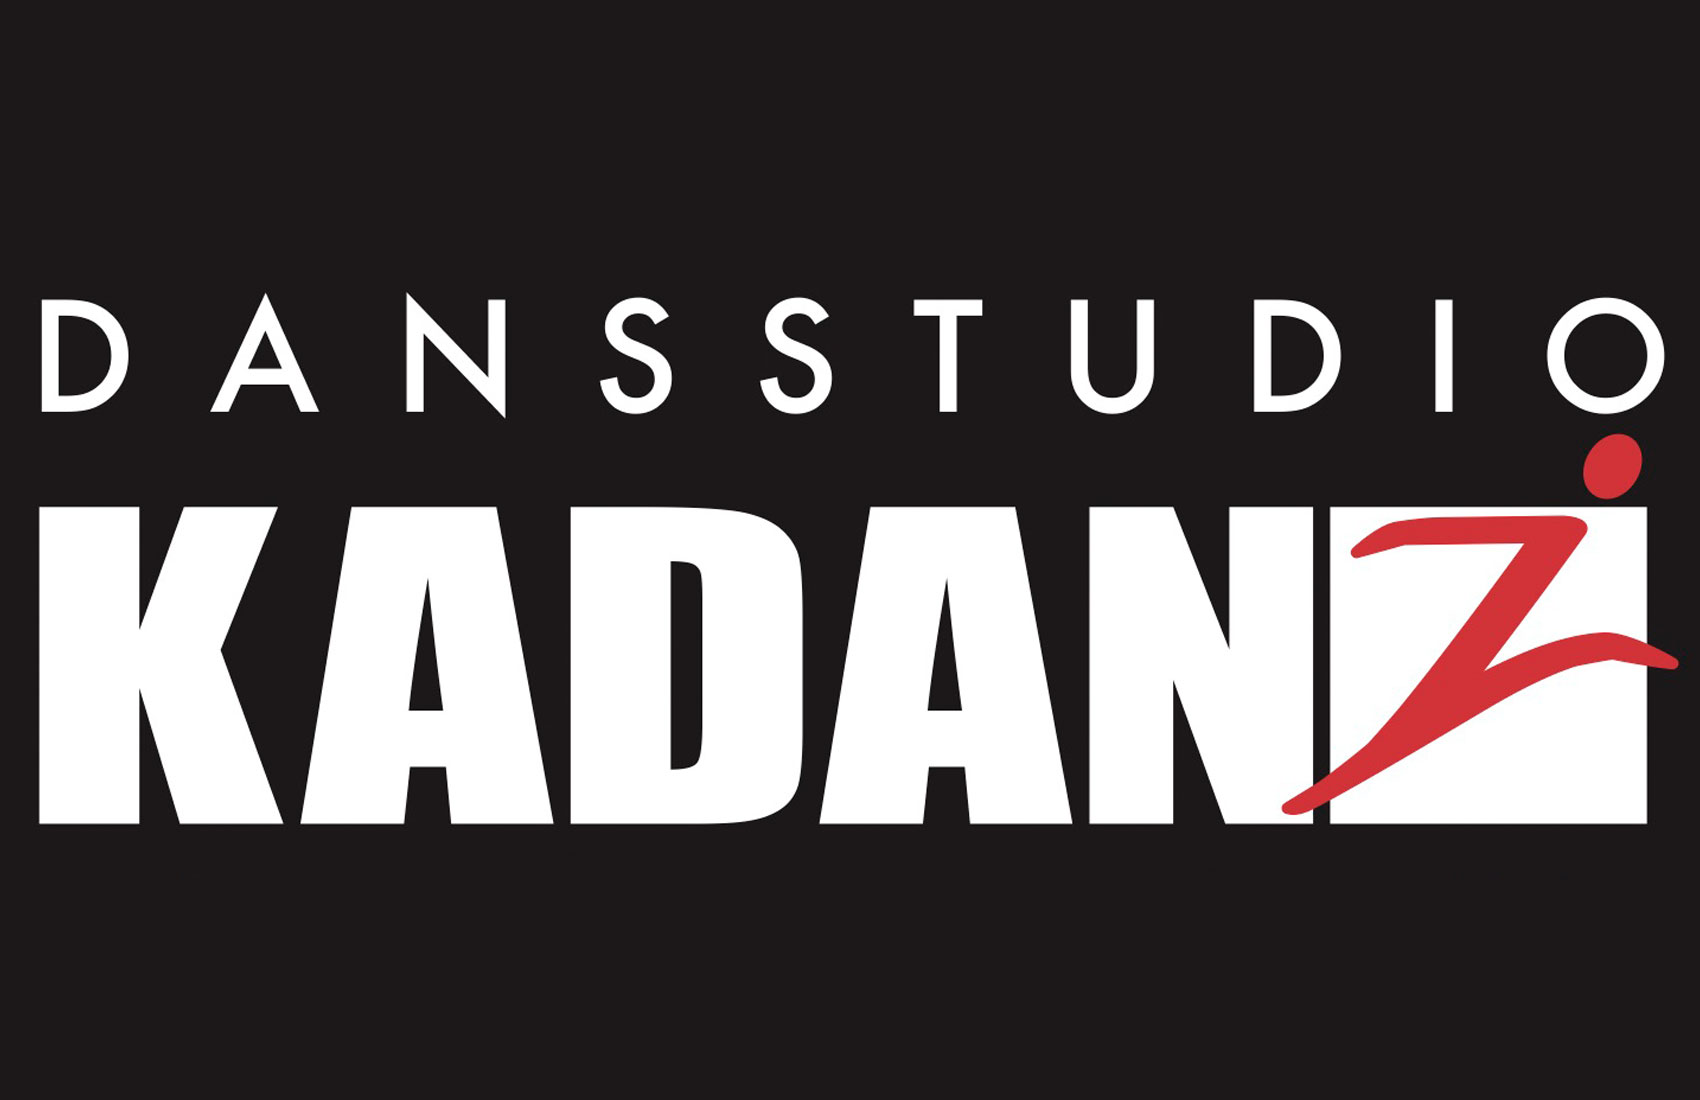 Dansstudio KaDanz